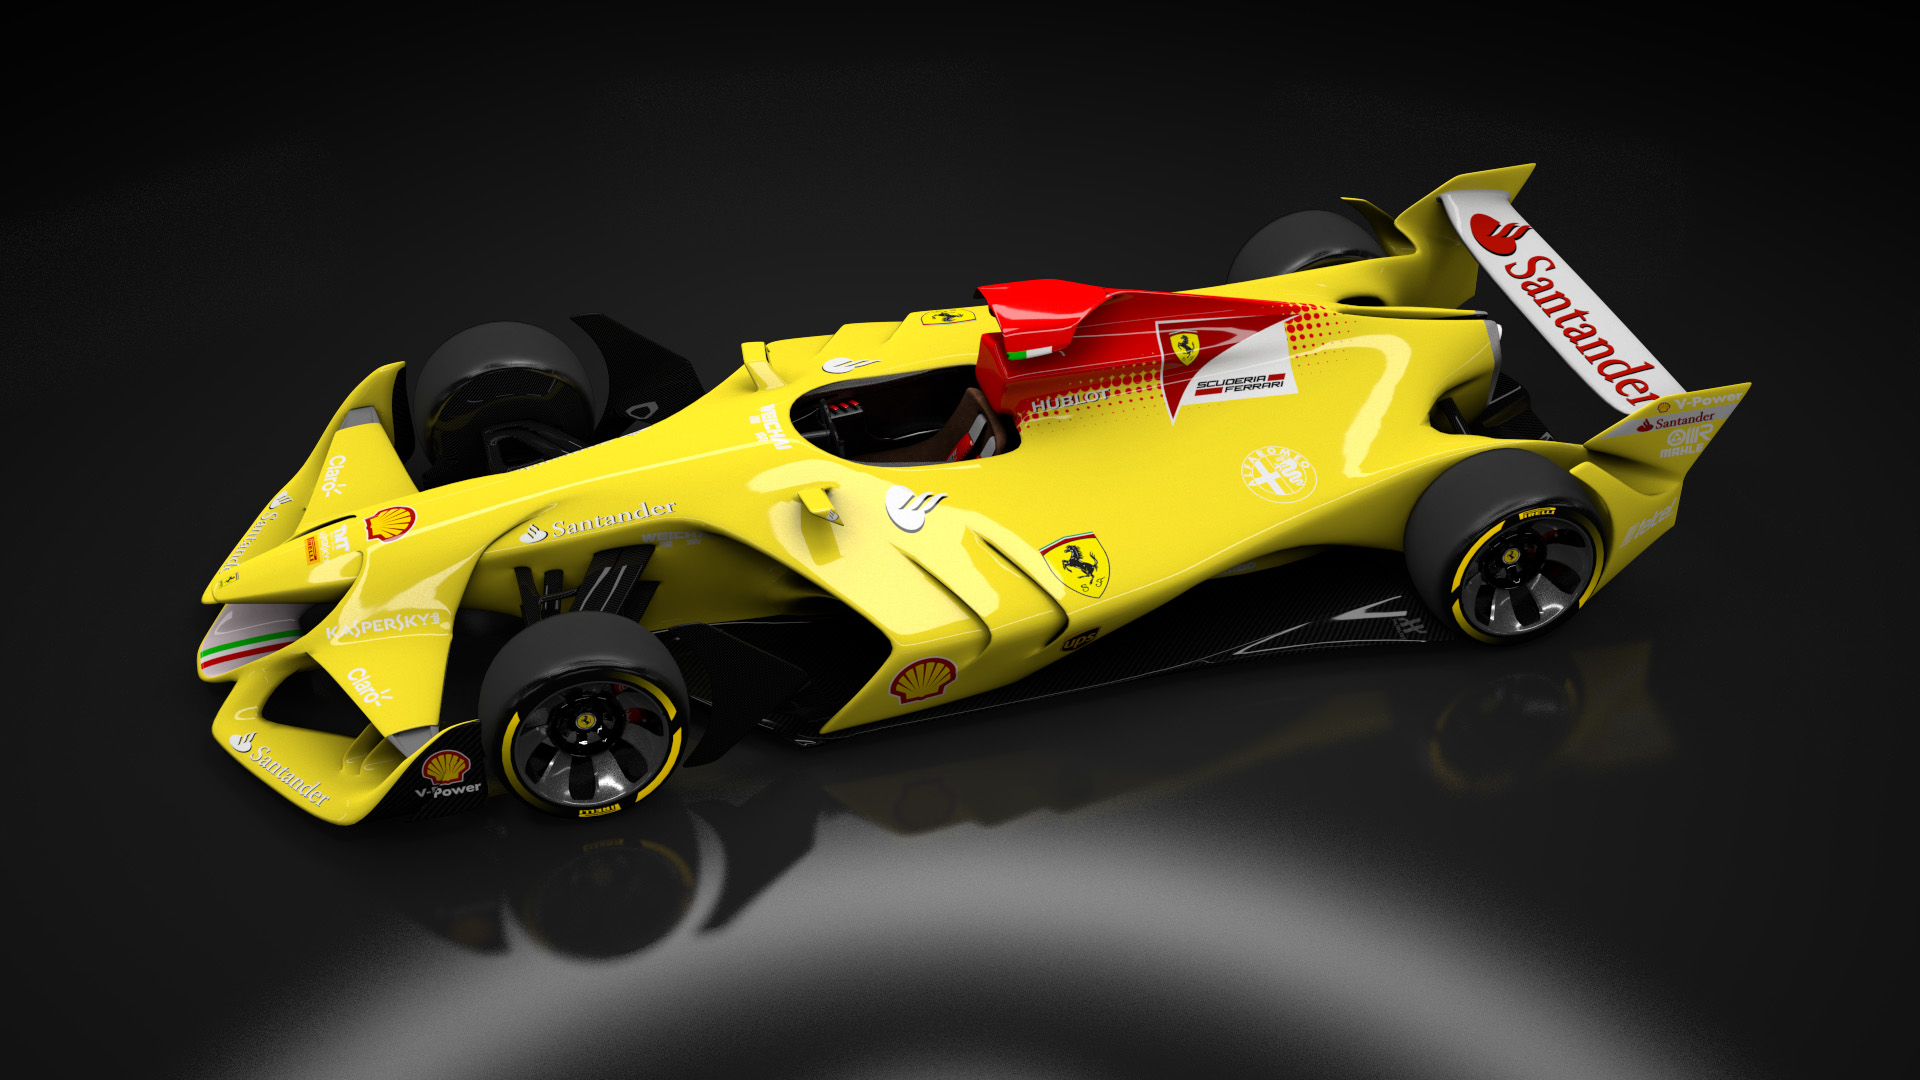 Ferrari F1 Concept 101 for AC  Released  VirtualRnet